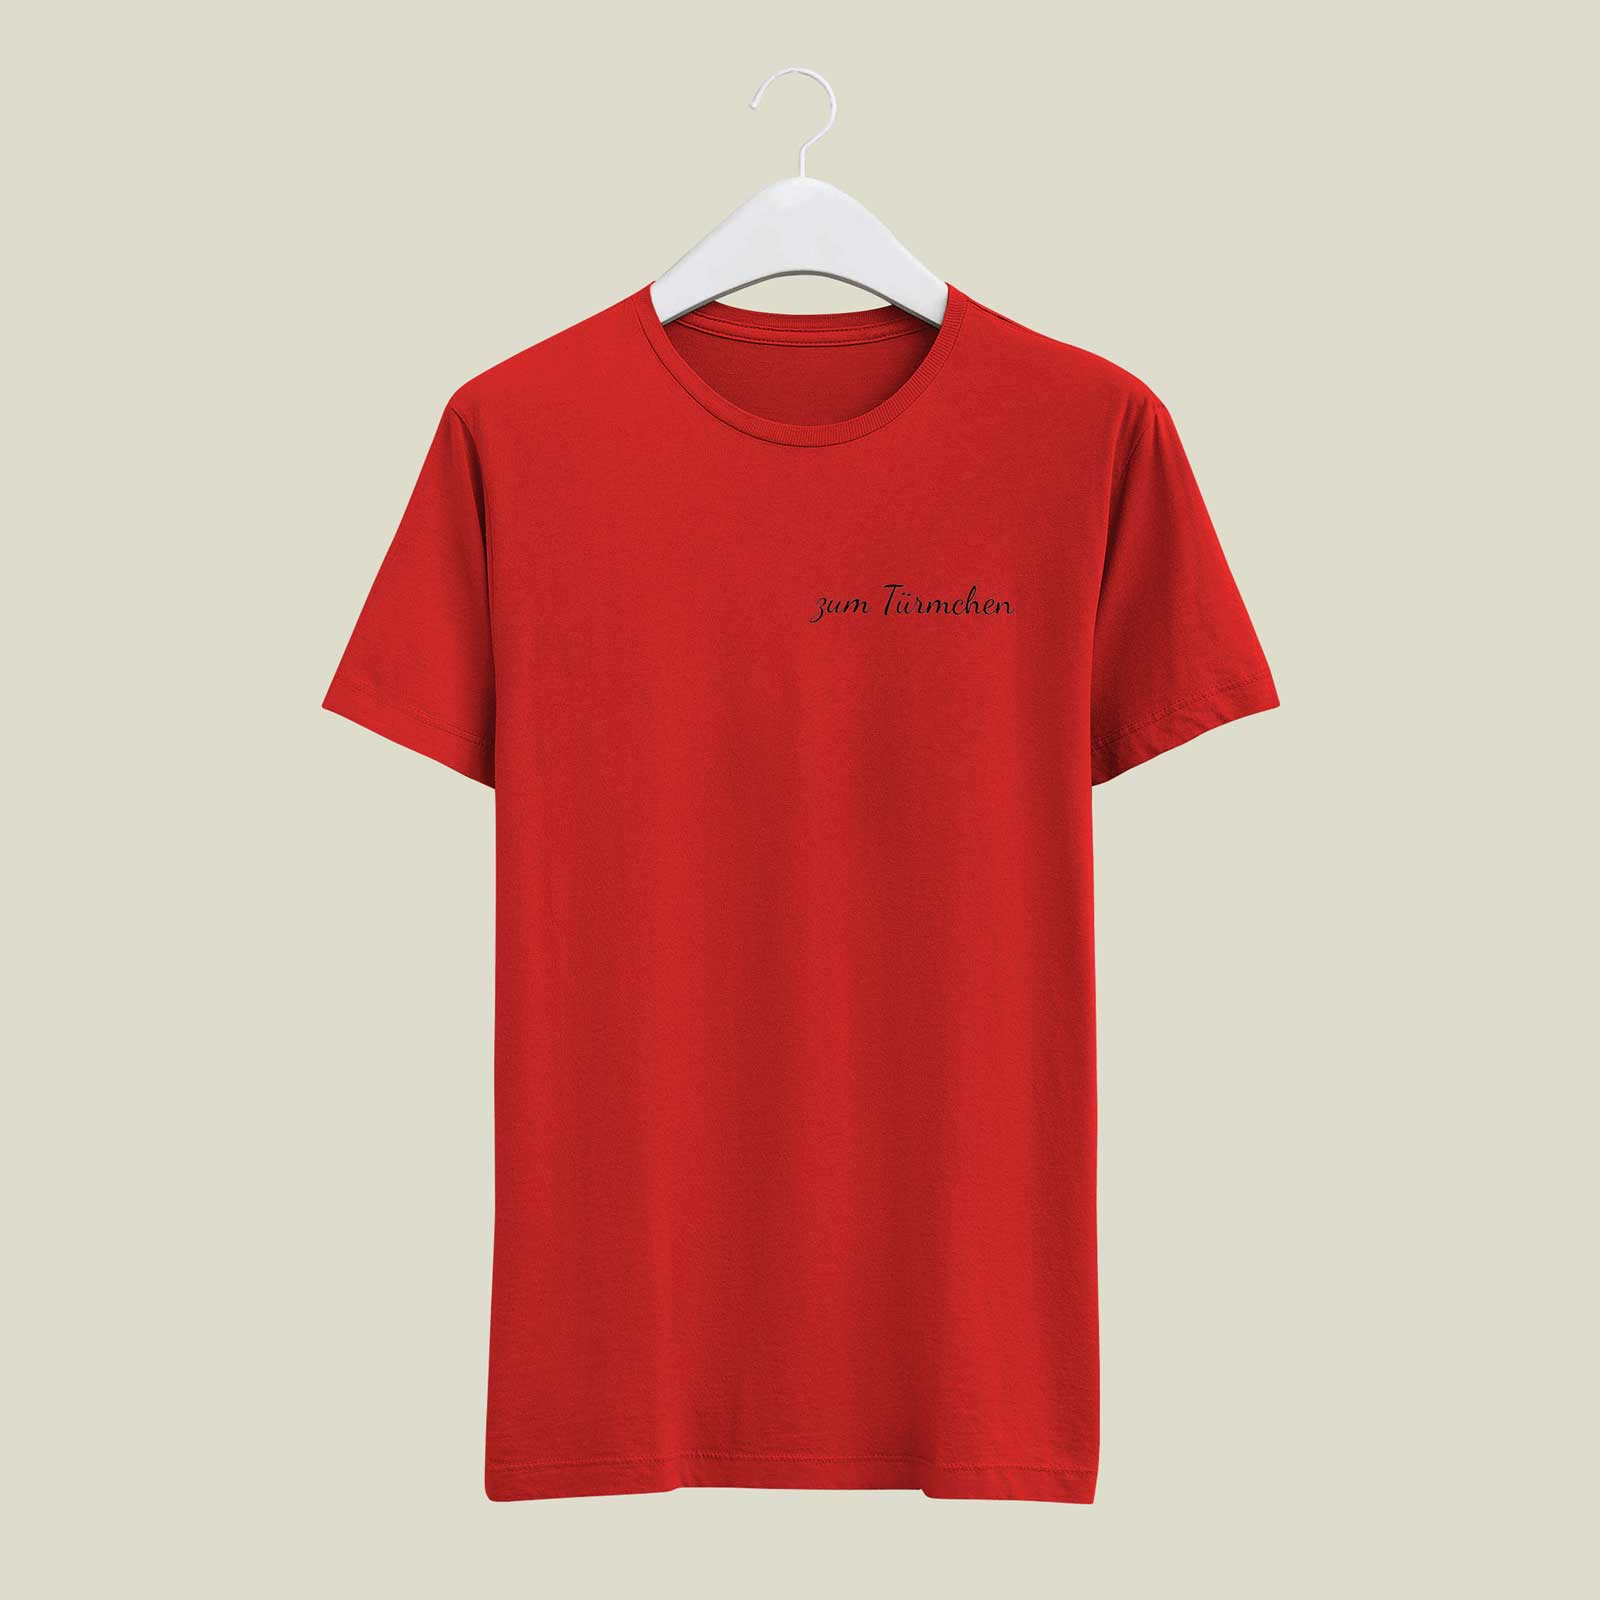 zum-tuermchen-kneipe-kirchheim-liebespixel-webdesign-logo-print-tshirt-rot